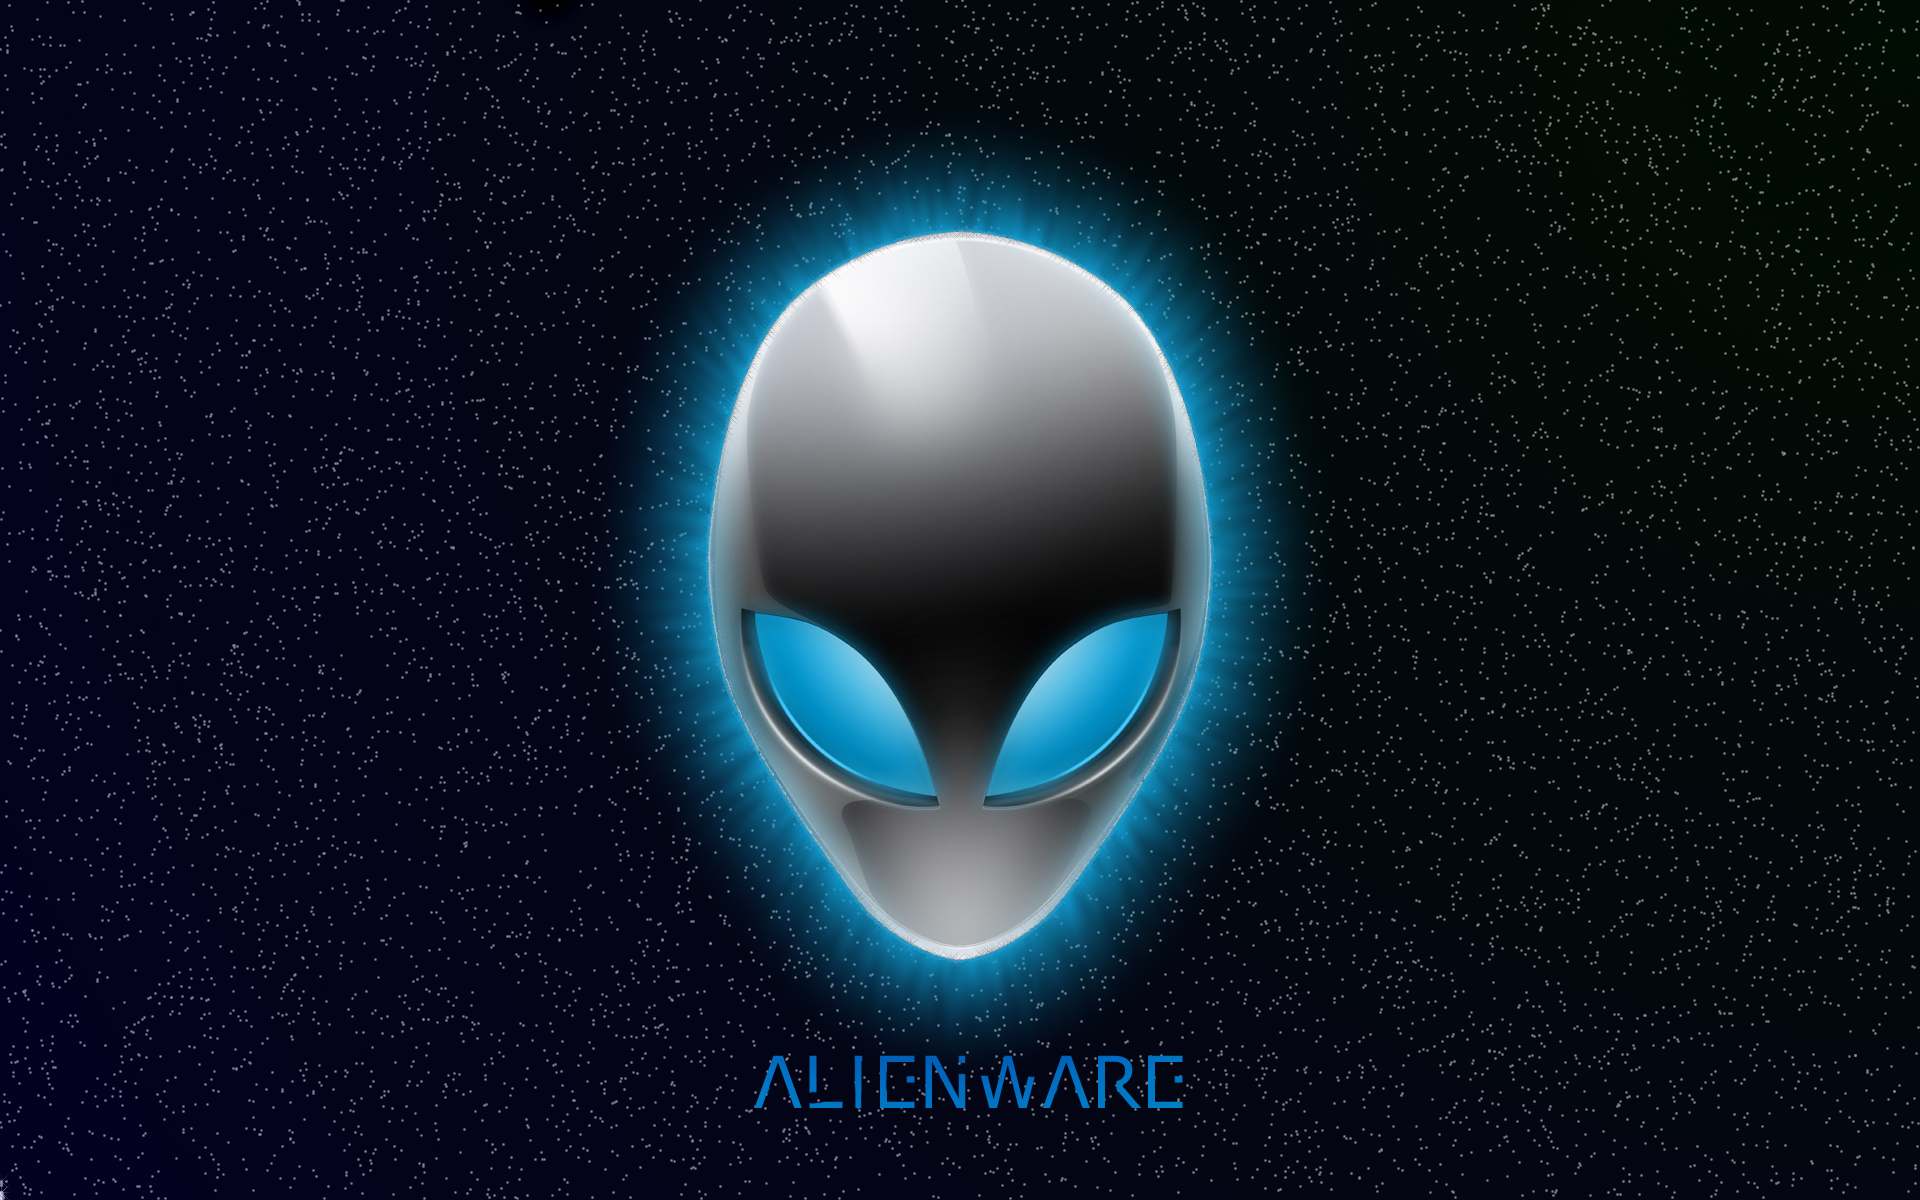 Alienwarewallpaperhd1080p 1920x1200